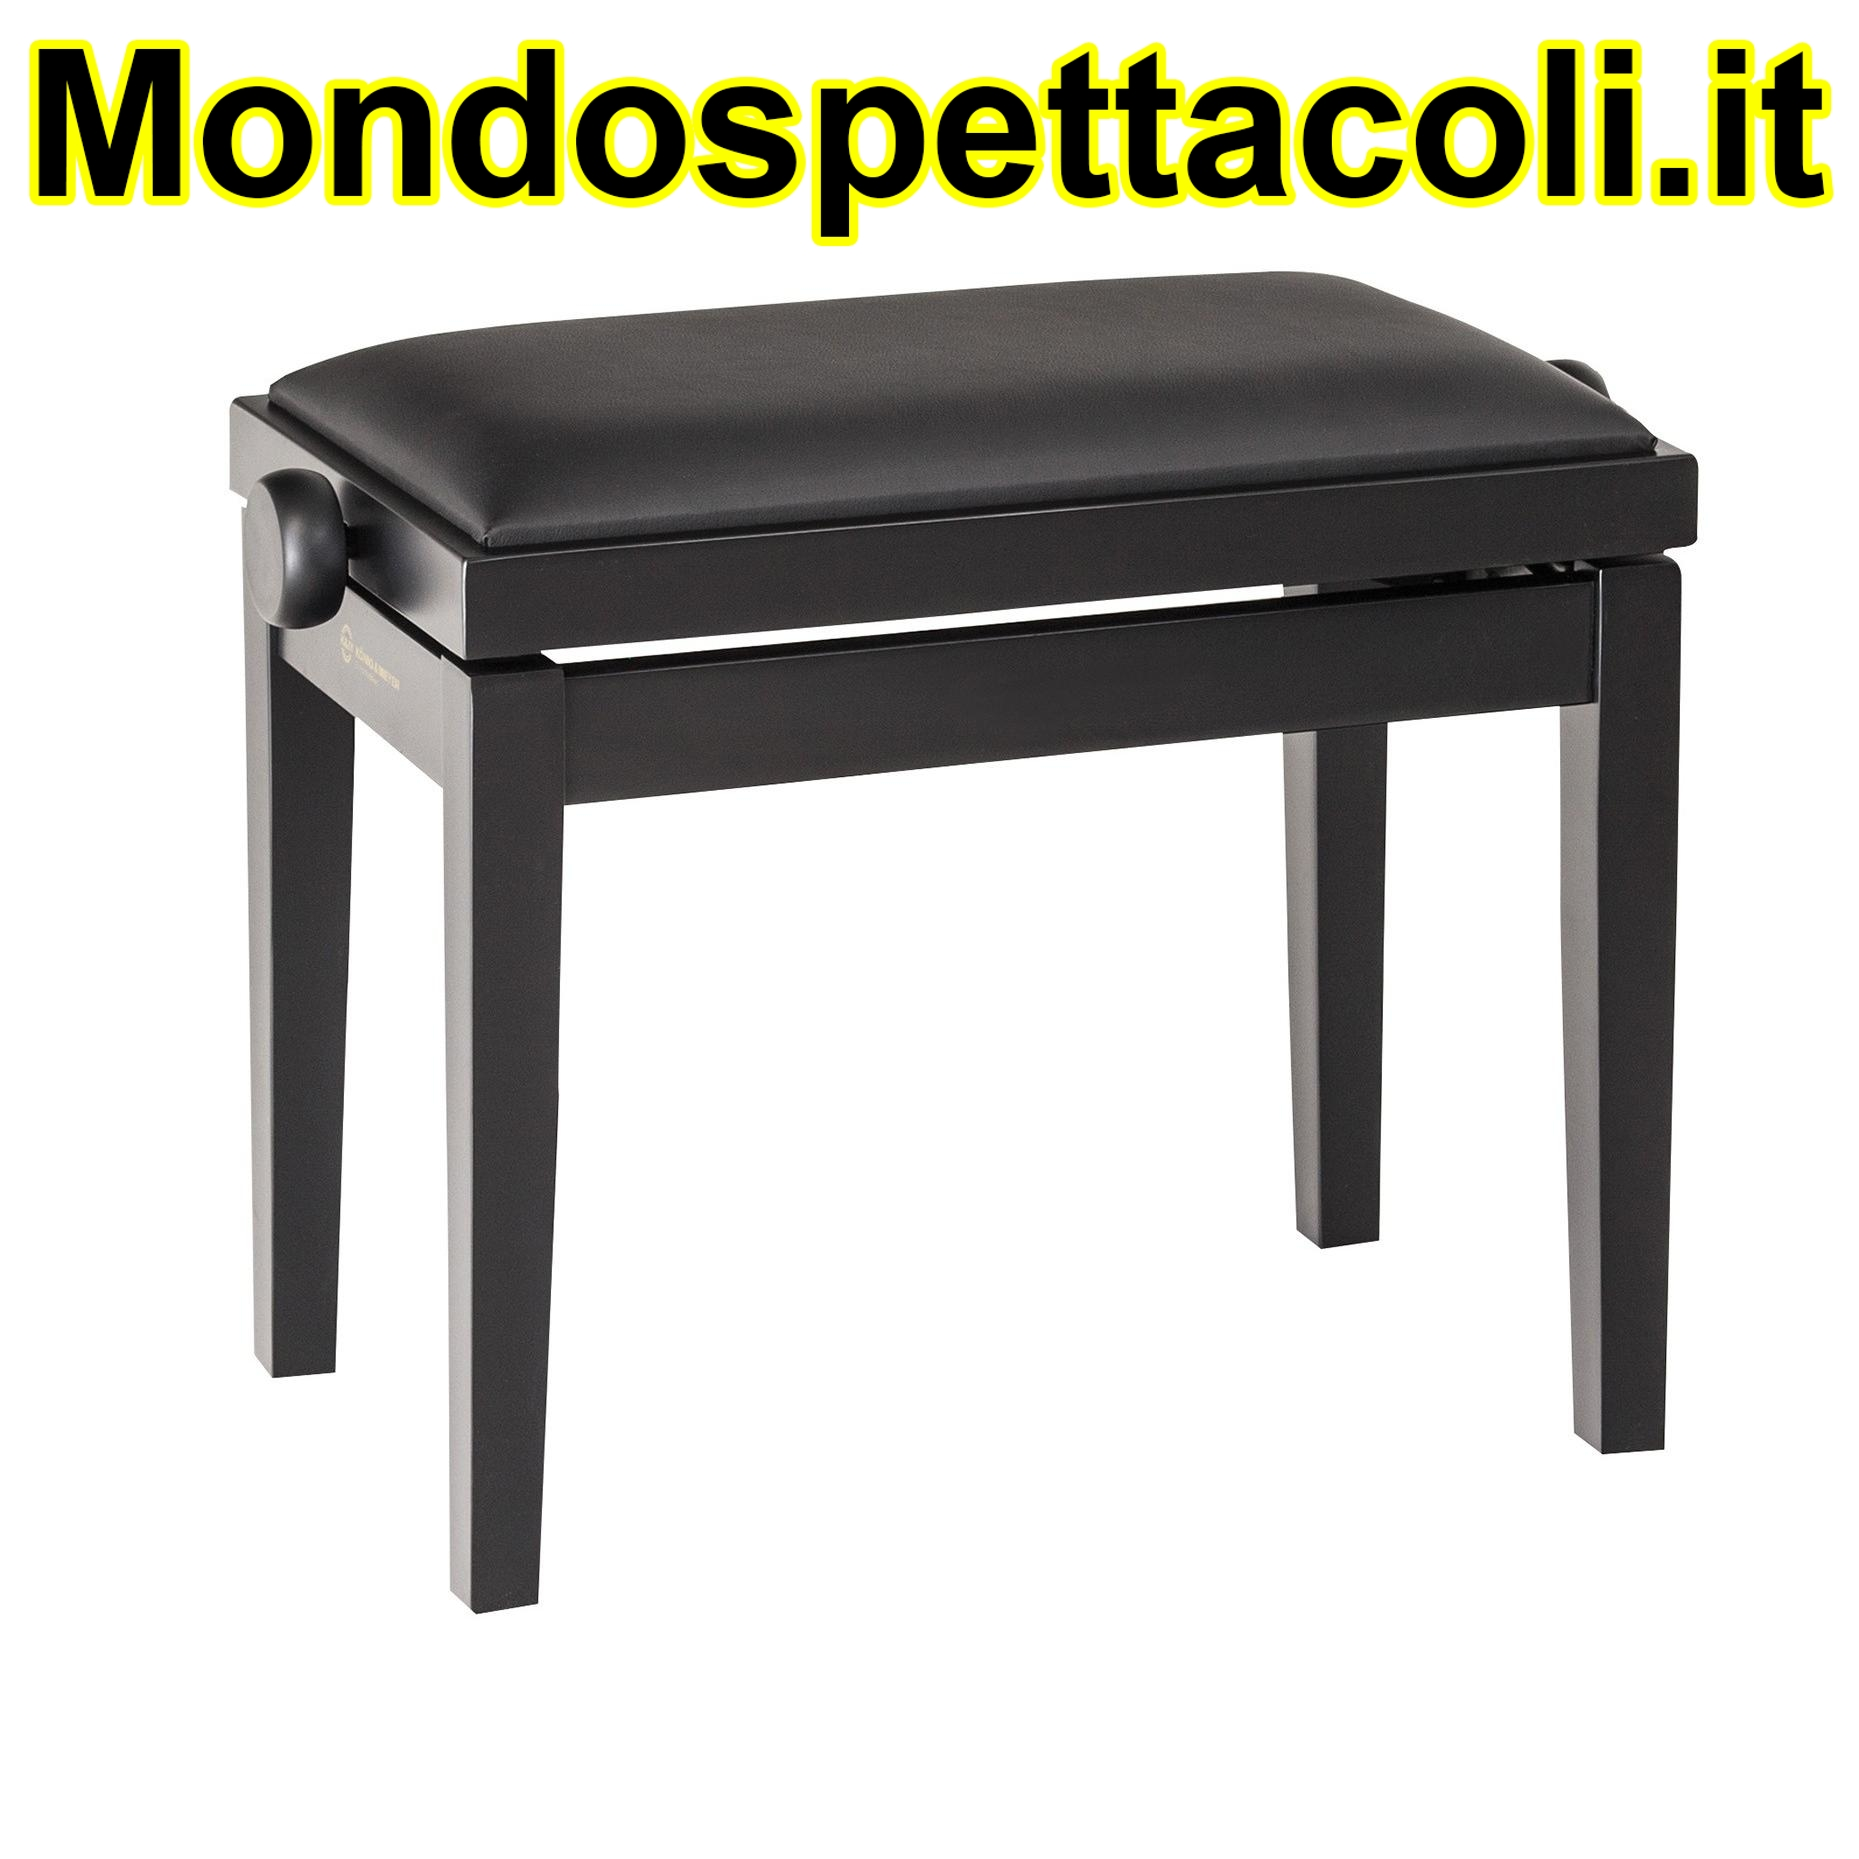 K&M bench black matt finish, seat black imitation leather Piano bench 13910-200-20